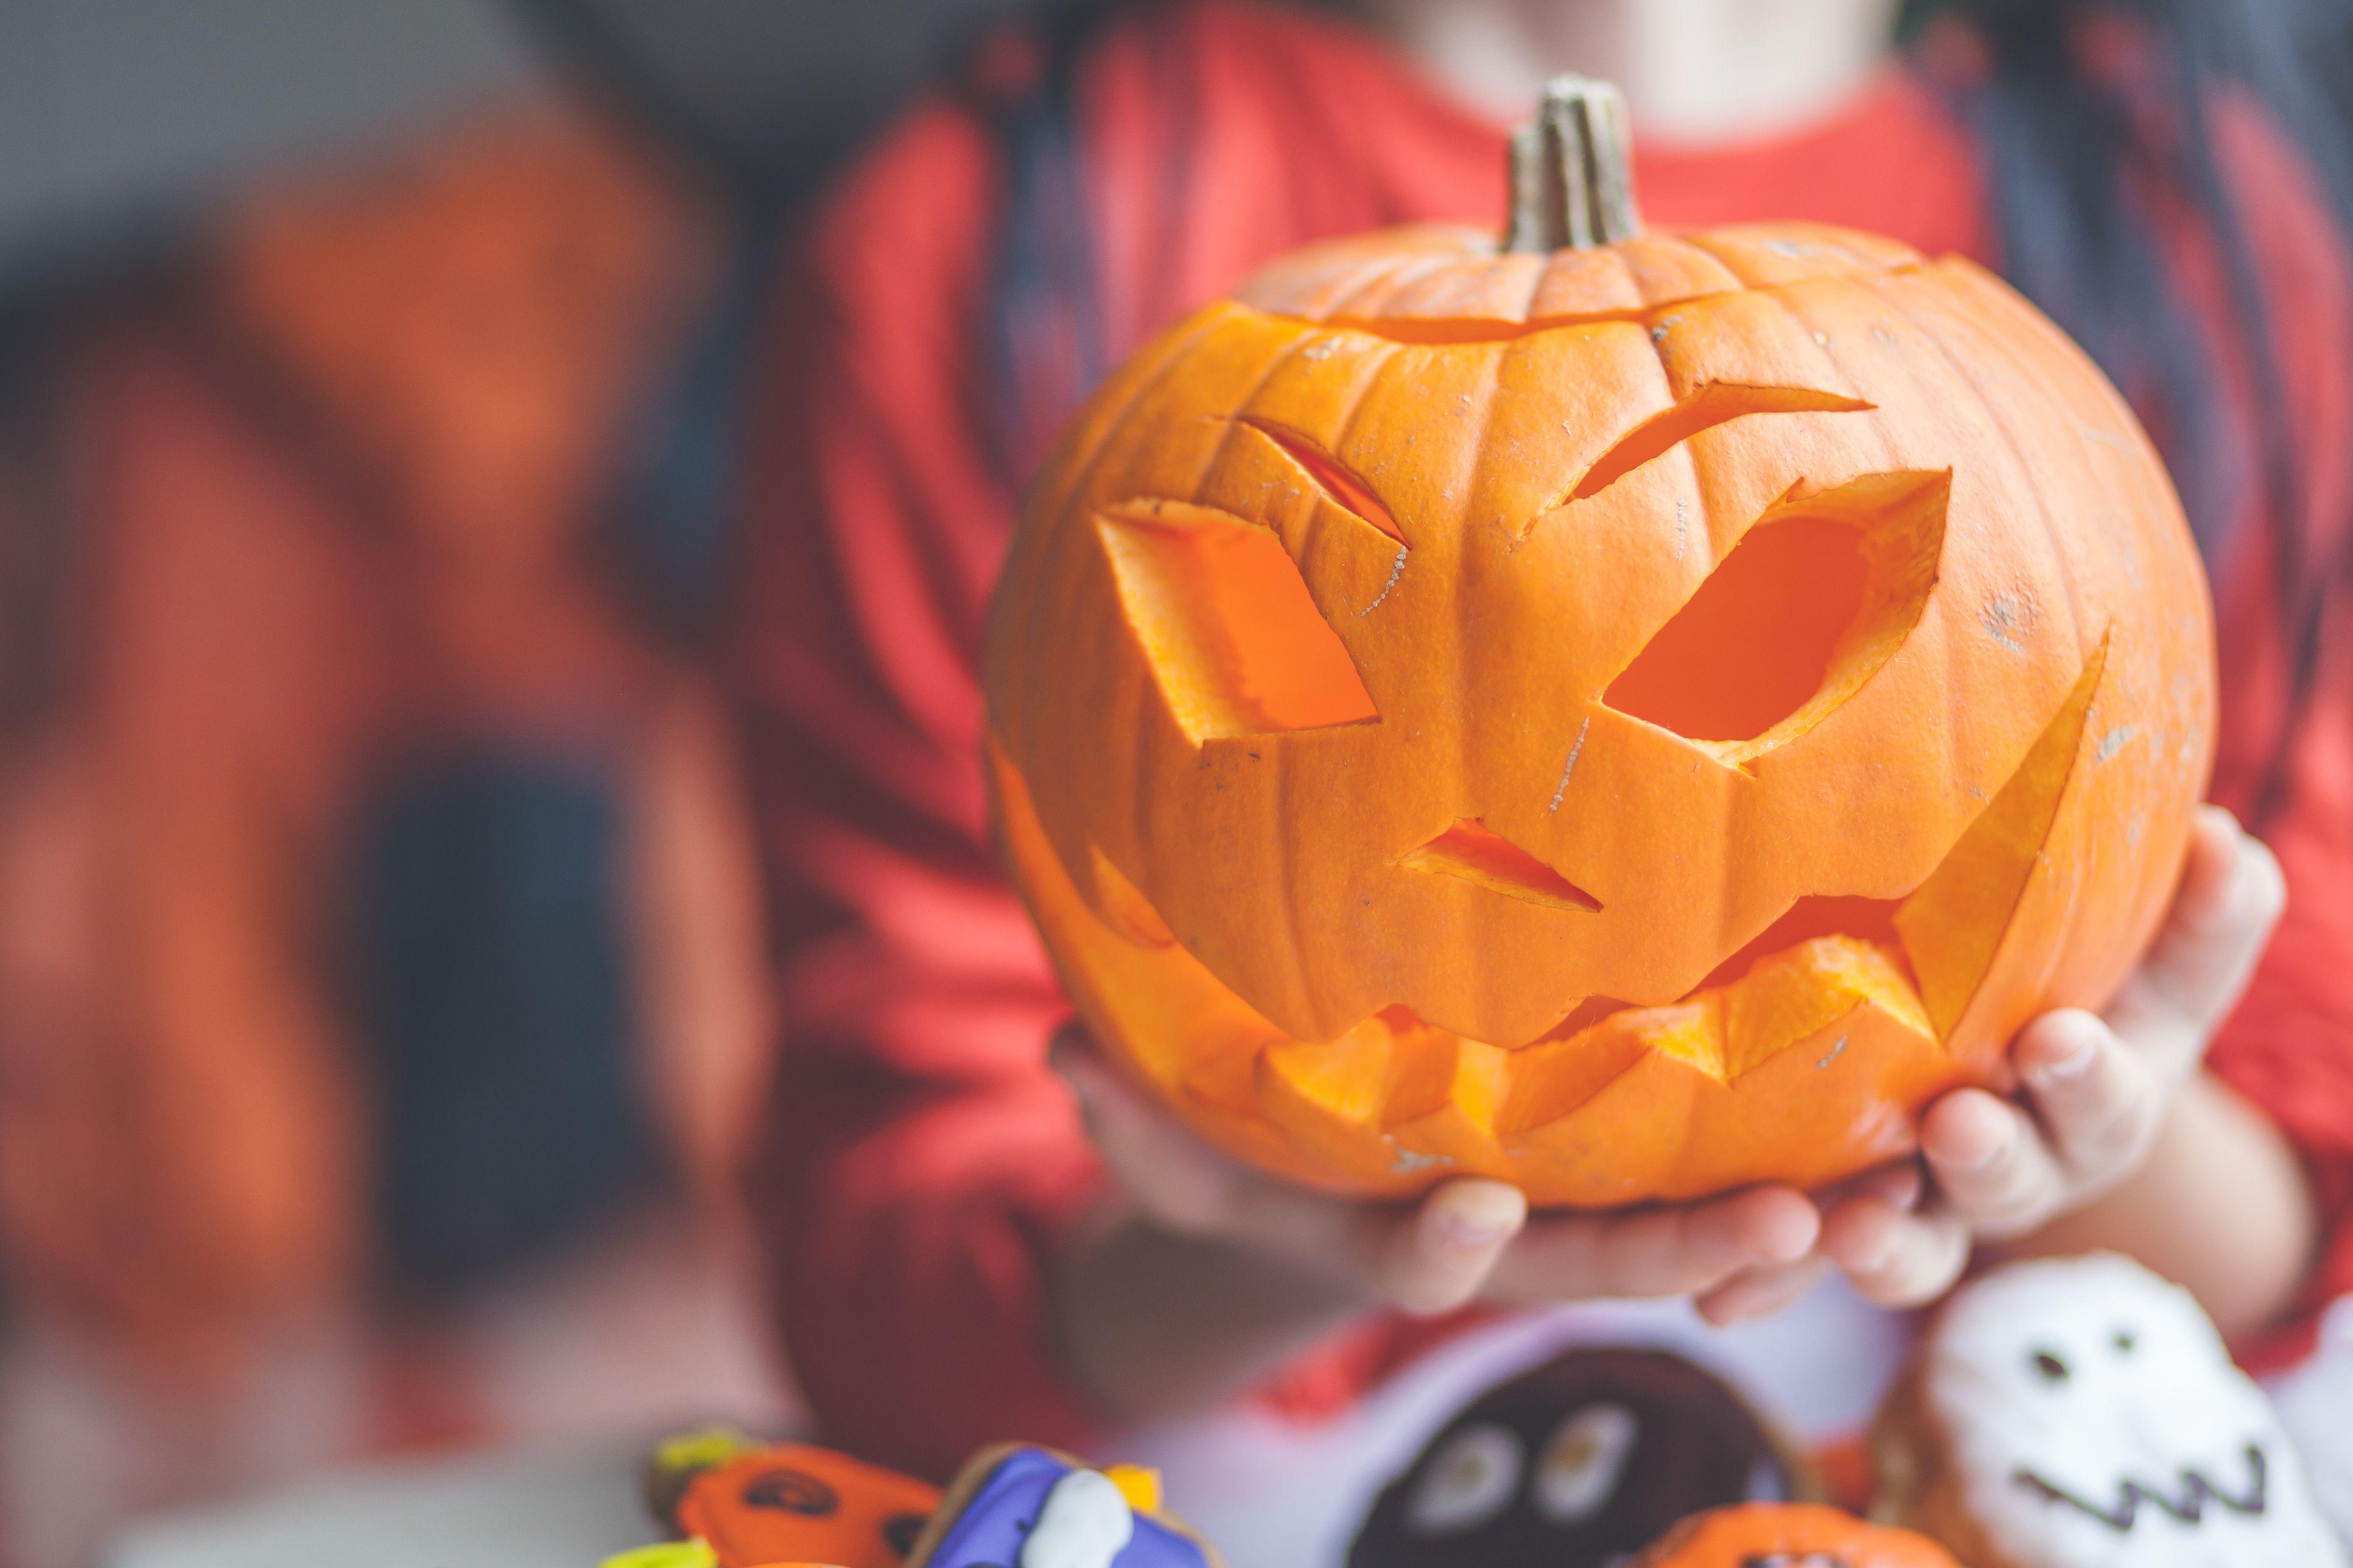 50 easy pumpkin carving ideas fun patterns \u0026 designs for 2018carved pumpkin ideas